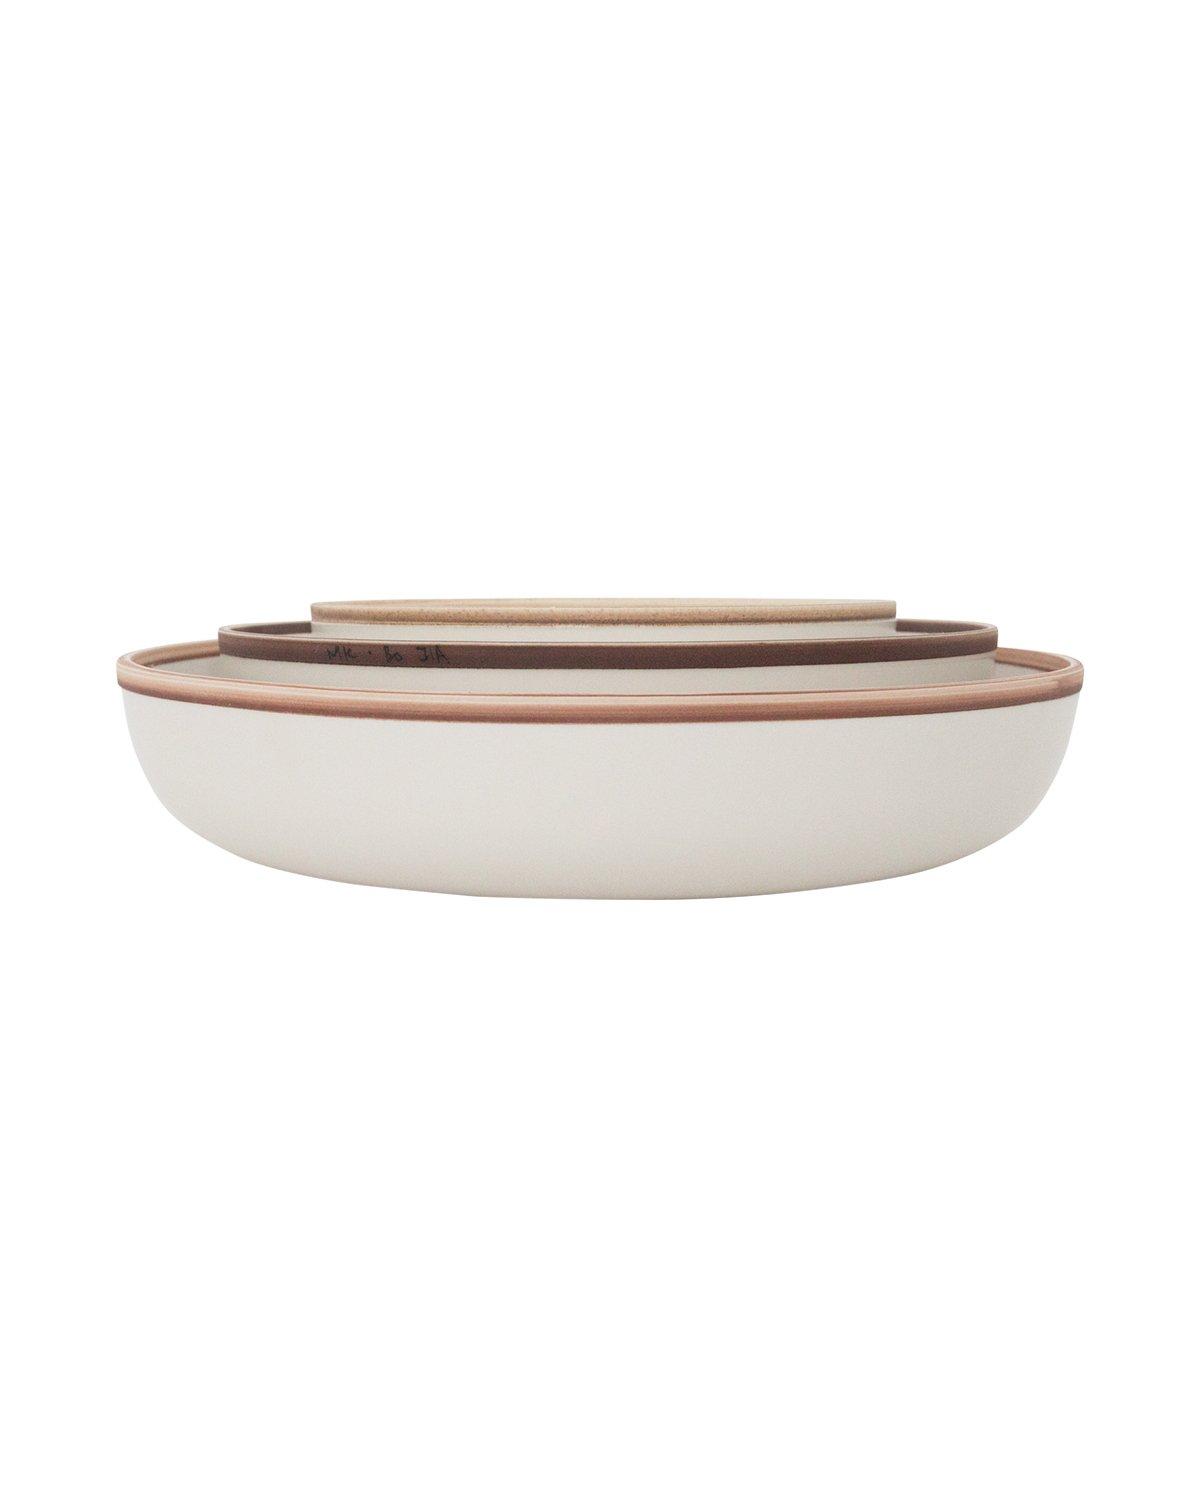 Glazed_Porcelain_Bowls_1.jpg